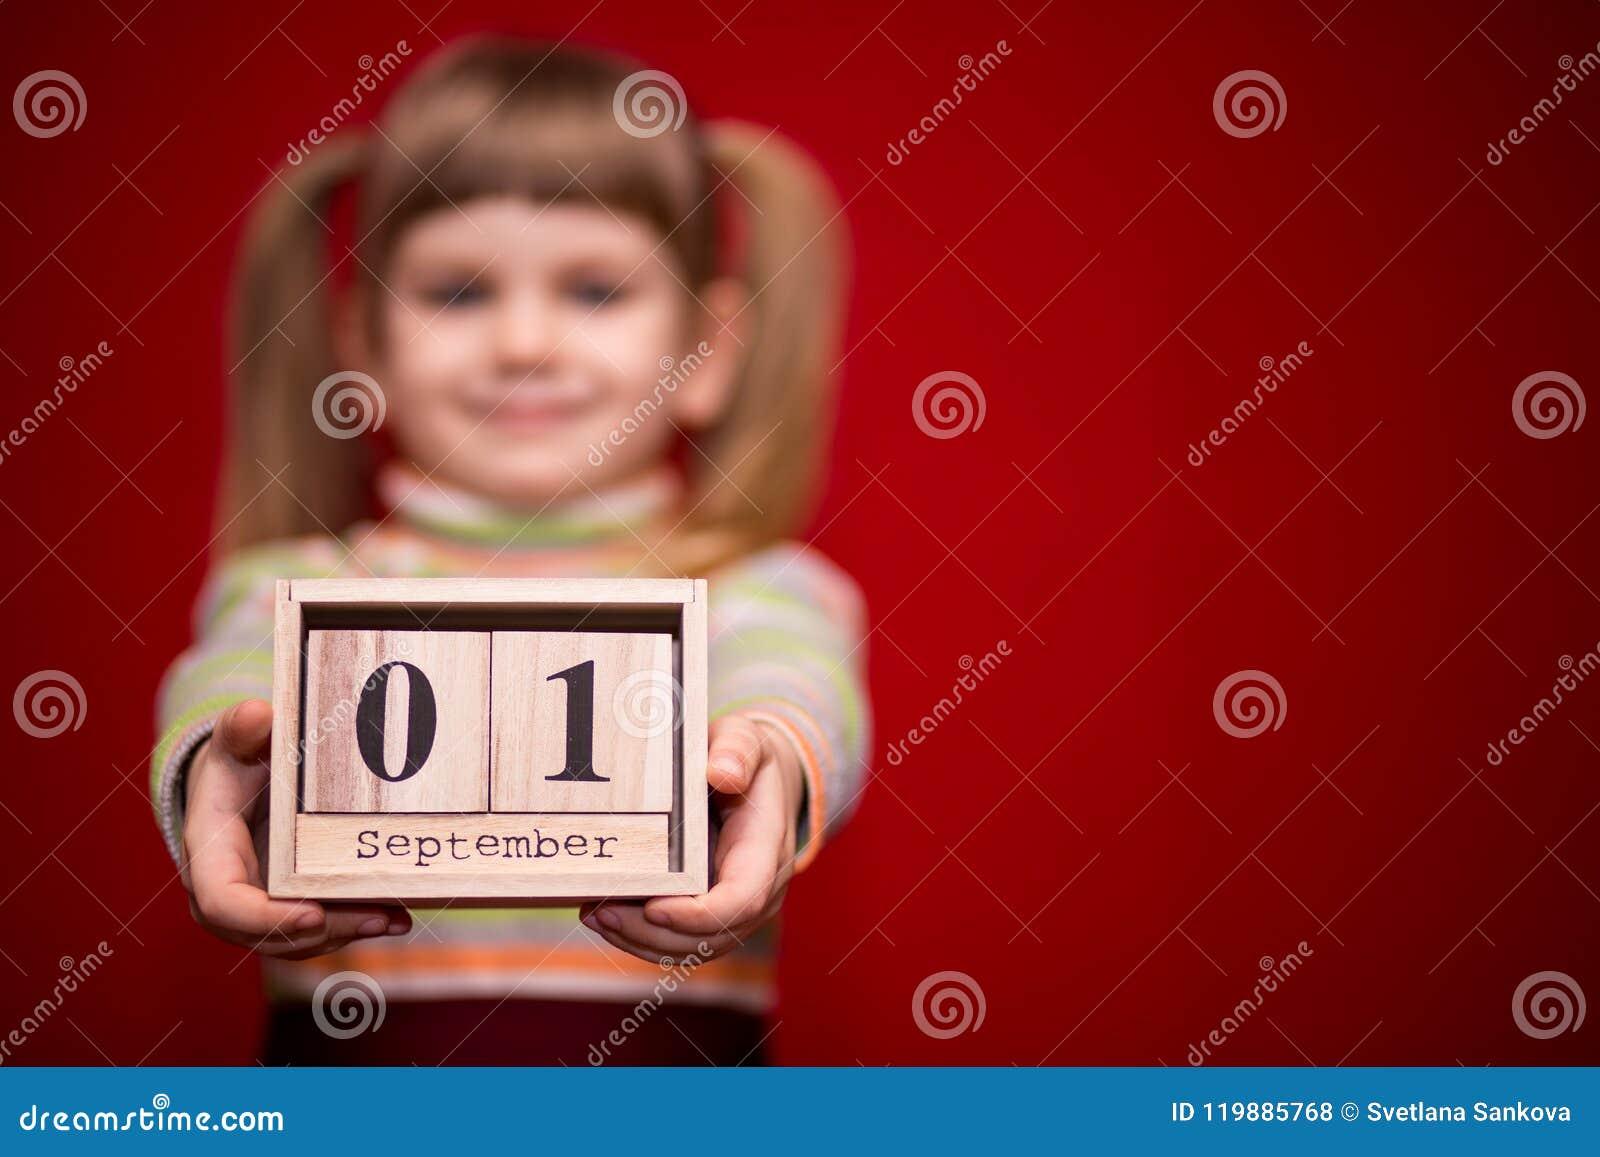 Portret van vrolijk die meisje op rode greep houten die kalender wordt geïsoleerd op fir september, nadruk op kalender wordt gepl